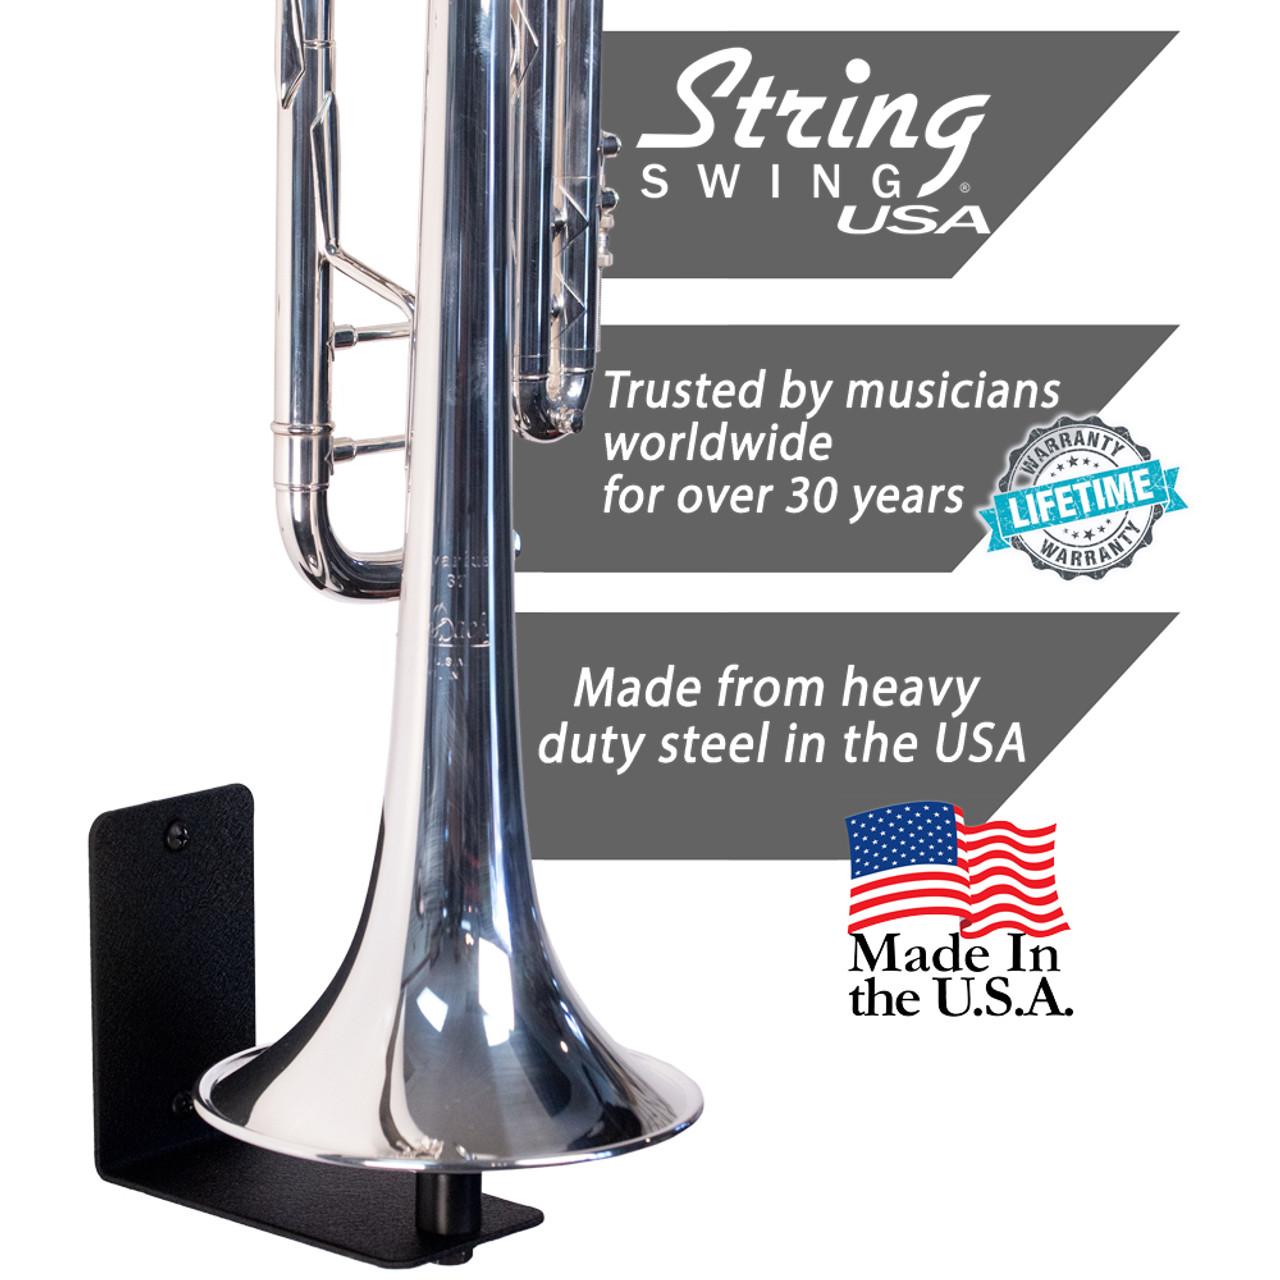 SDENSHI Trumpet Wall Hanger Brass Instrument Trumpet Holder Wall Mount as described